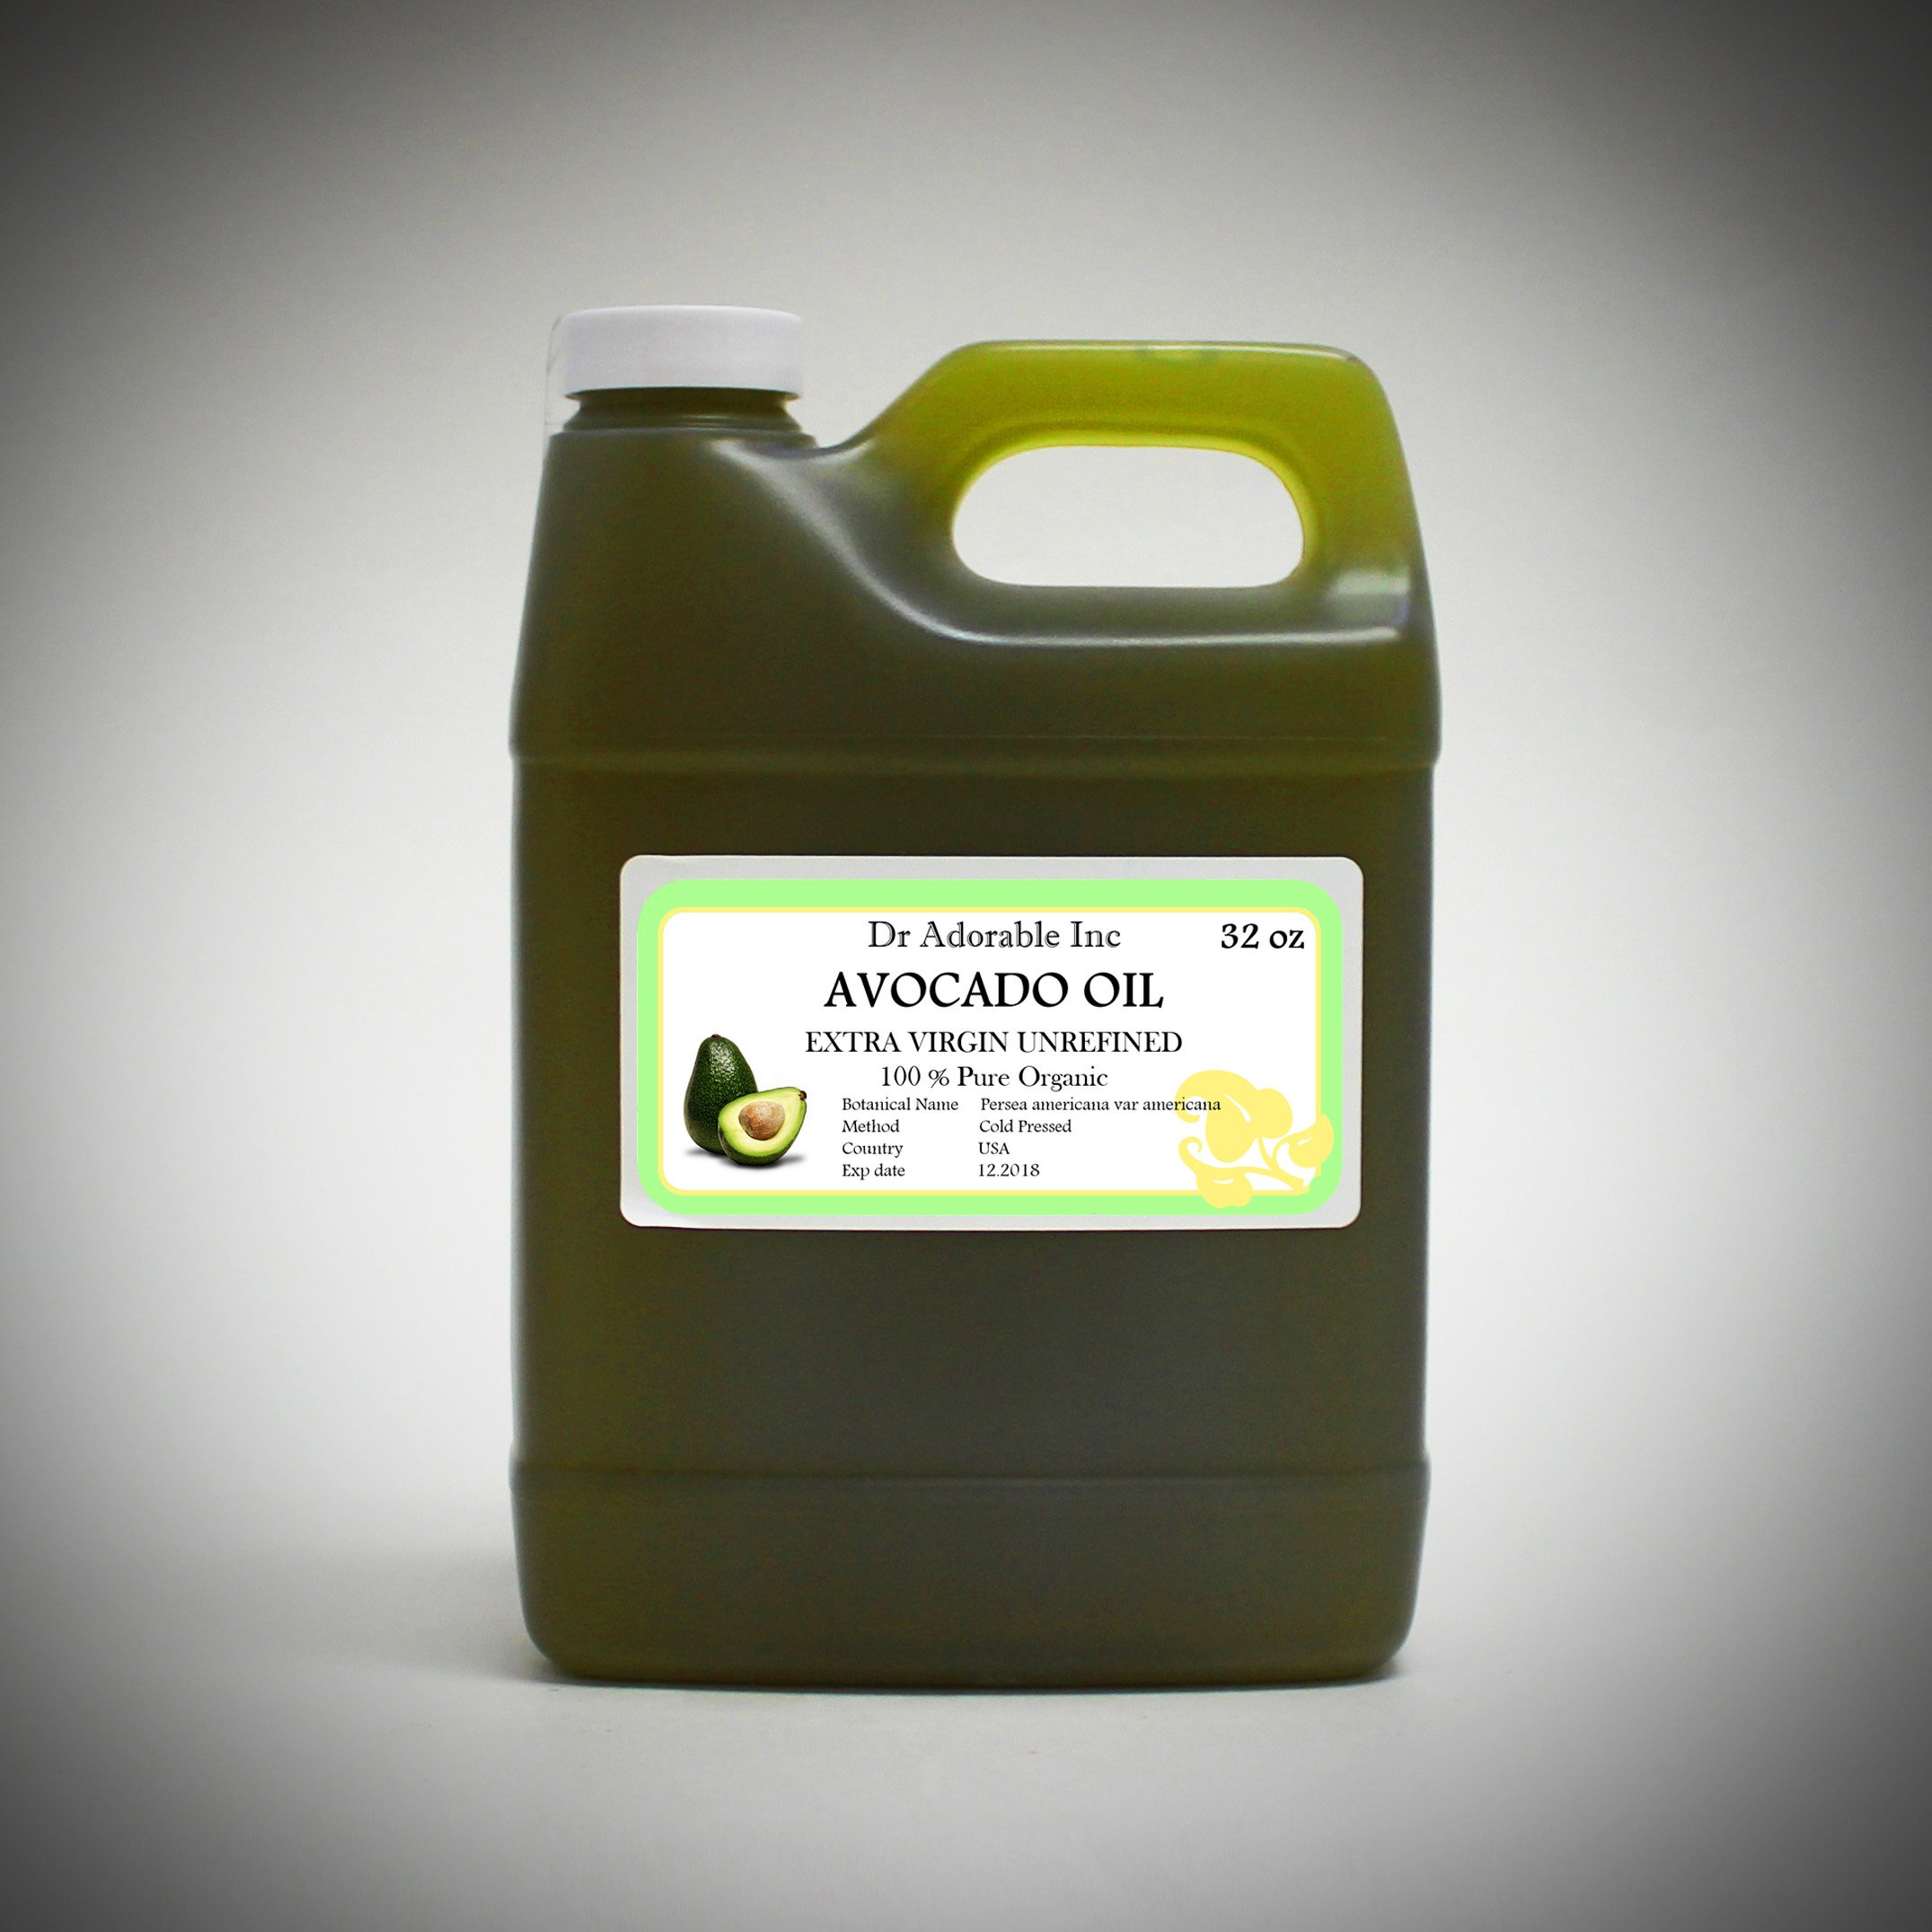 32 OZ PREMIUM AVOCADO OIL EXTRA VIRGIN RAW UNREFINED ORGANIC COLD PRESSED by Dr Adorable